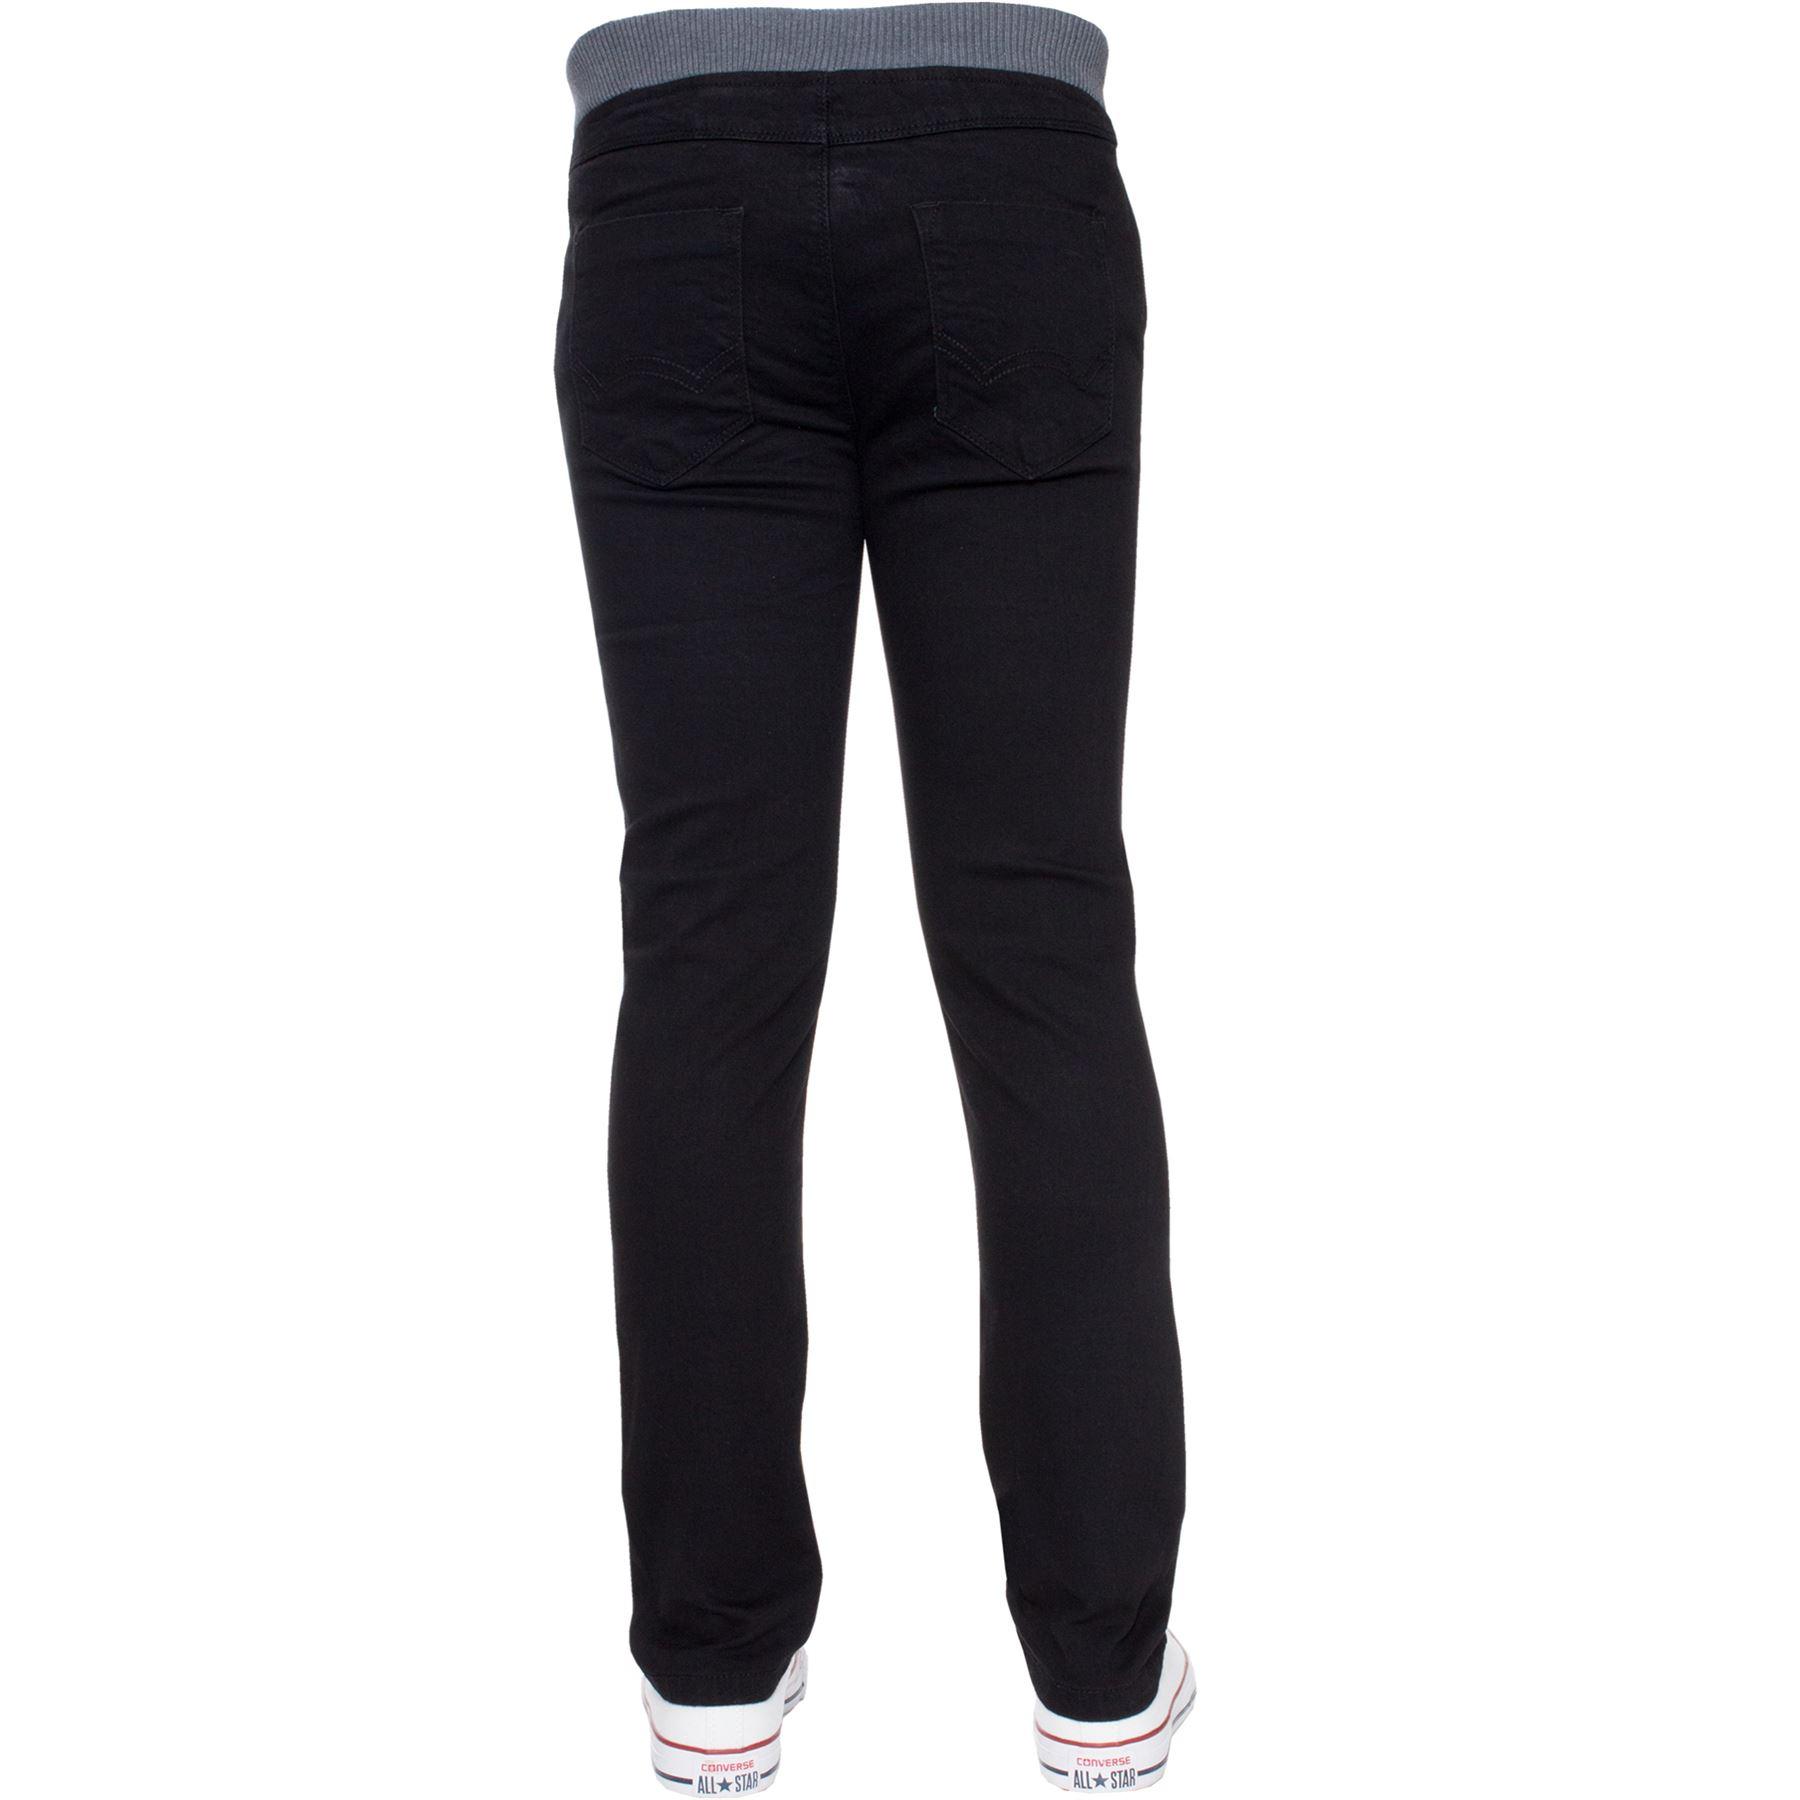 Jean-Garcon-Taille-Elastique-Enfants-Skinny-Stretch-School-Denim-Pantalon-Pantalon miniature 6